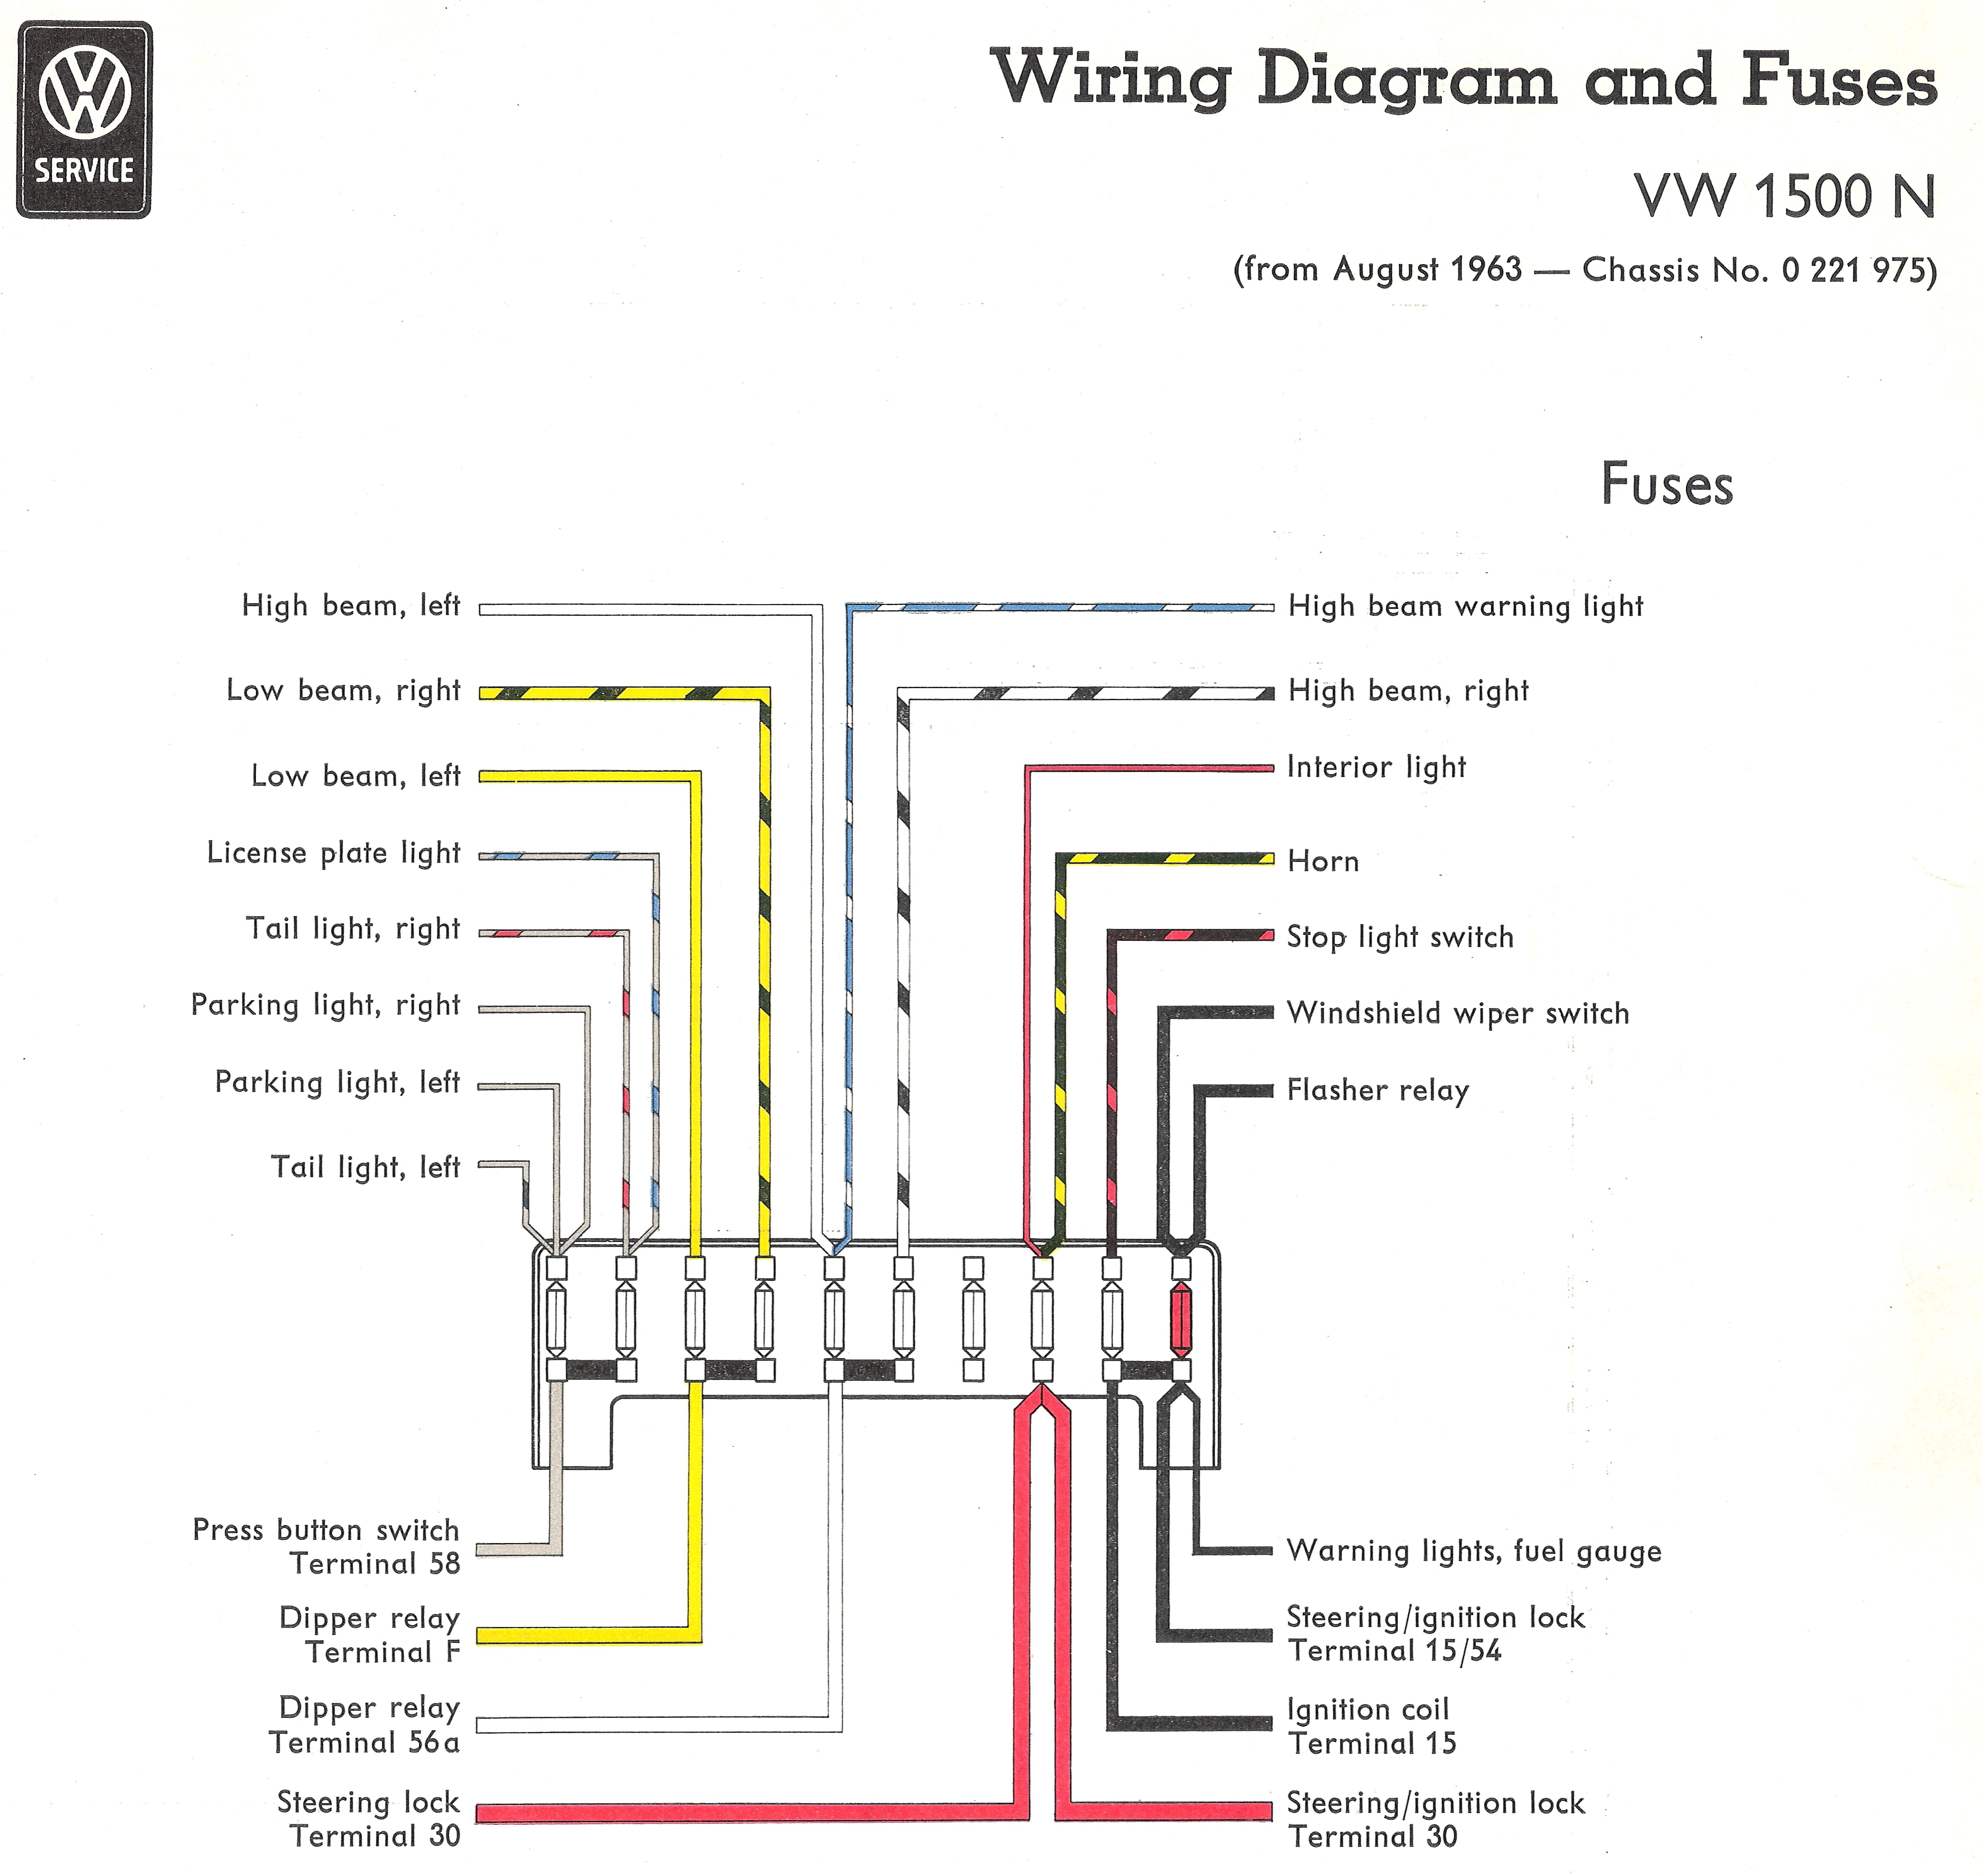 Car Fuse Diagram T4 Fuse Box Diagram – Wire Diagram Of Car Fuse Diagram